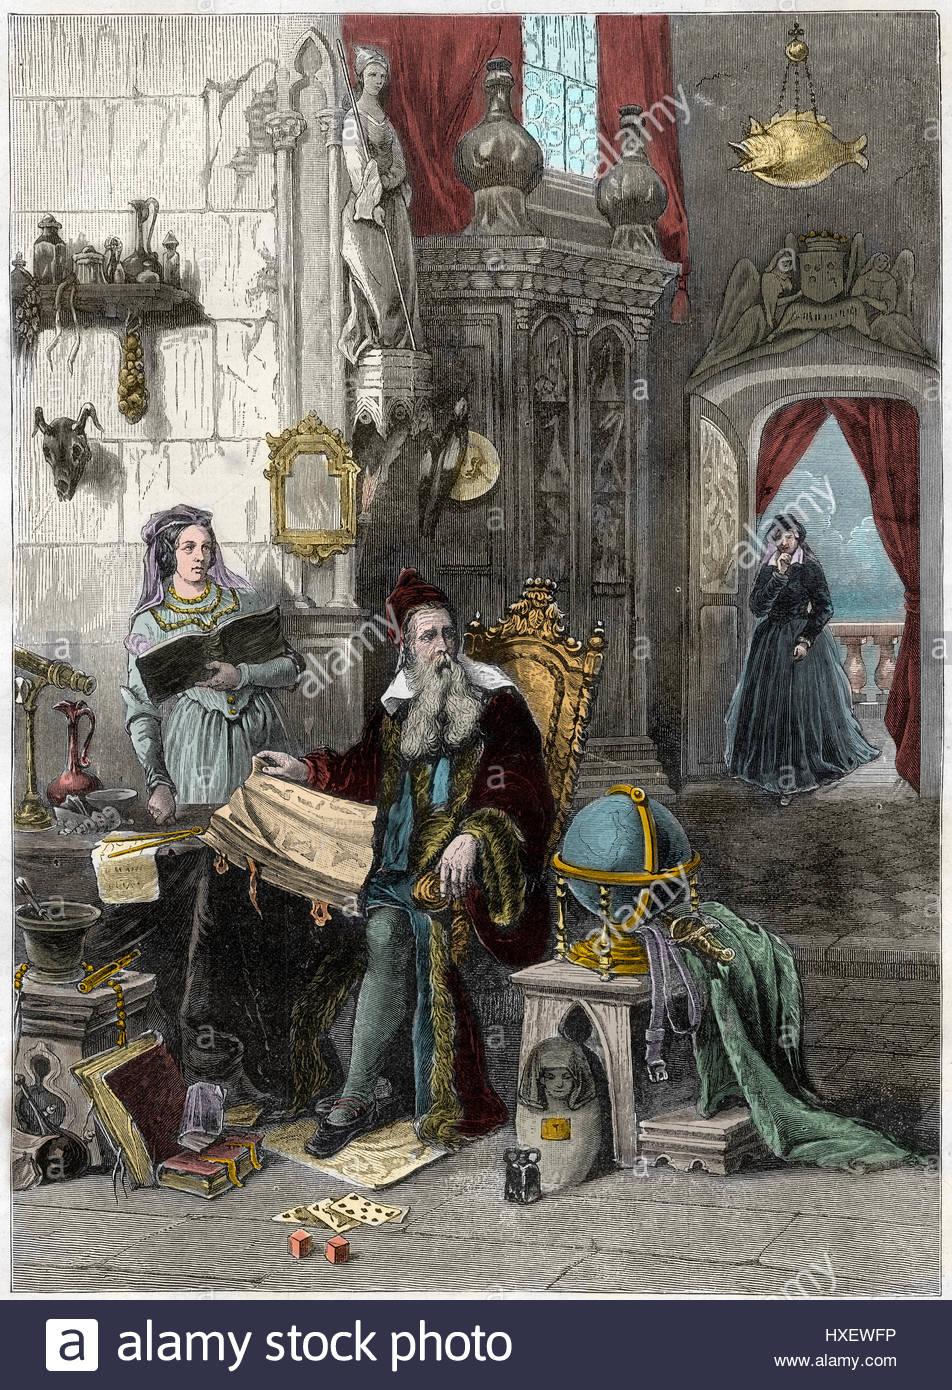 Catherine de Medici, 1519-1589, and her astrologer Nostradamus, 1503-1566 -  Portrait de Nostradamus, Michel de Notre Dame (1503-1566) astrologue et me